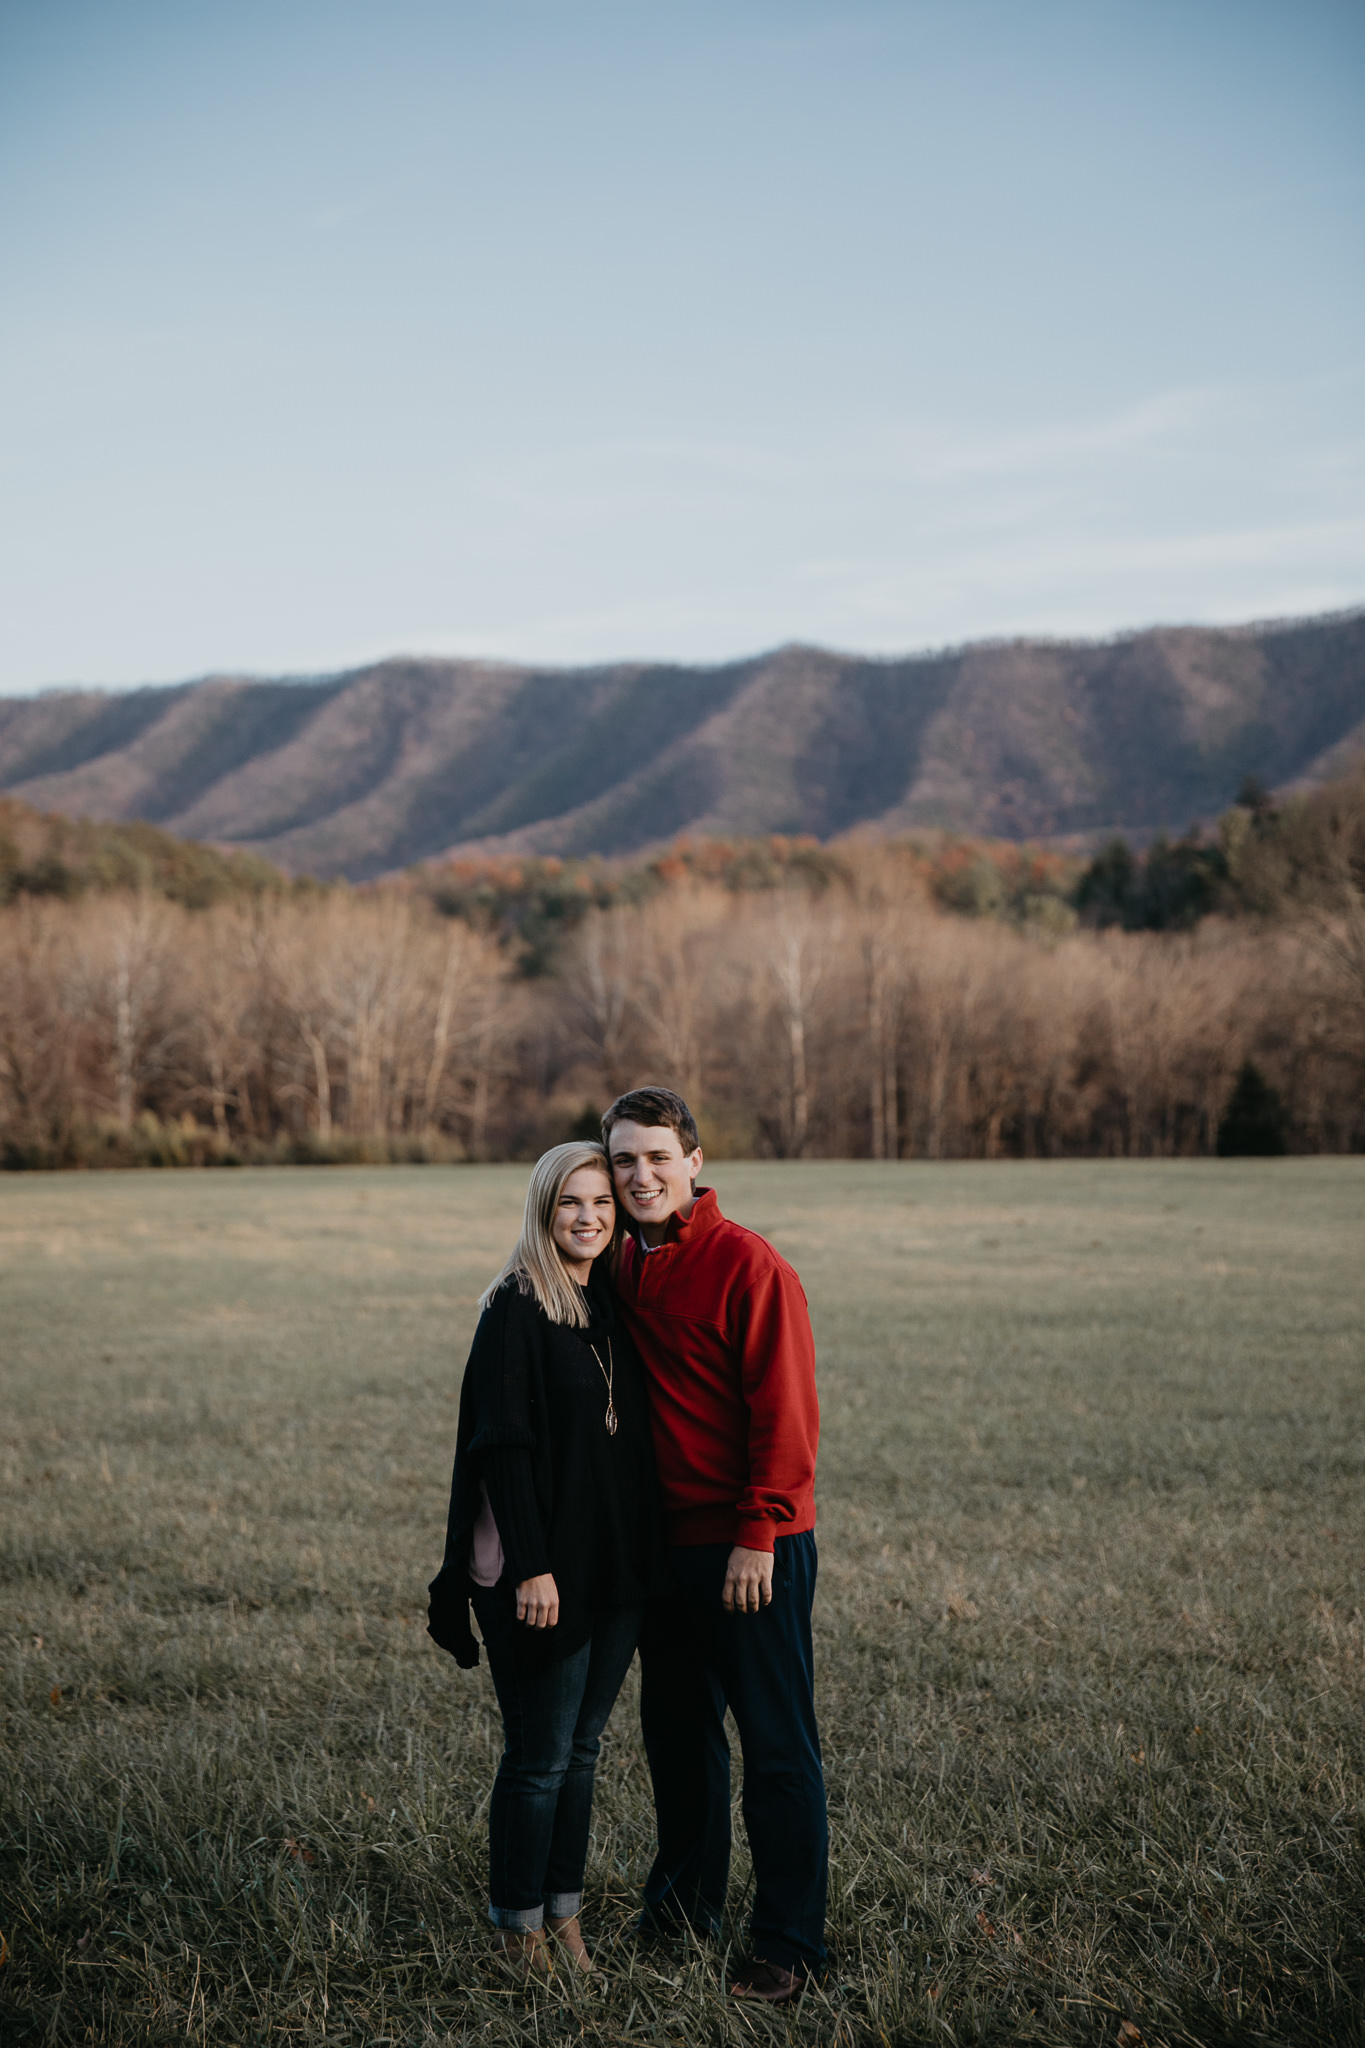 Roanoke - Engagement- Virginia wedding photographer - Pat Cori Photography-25.jpg